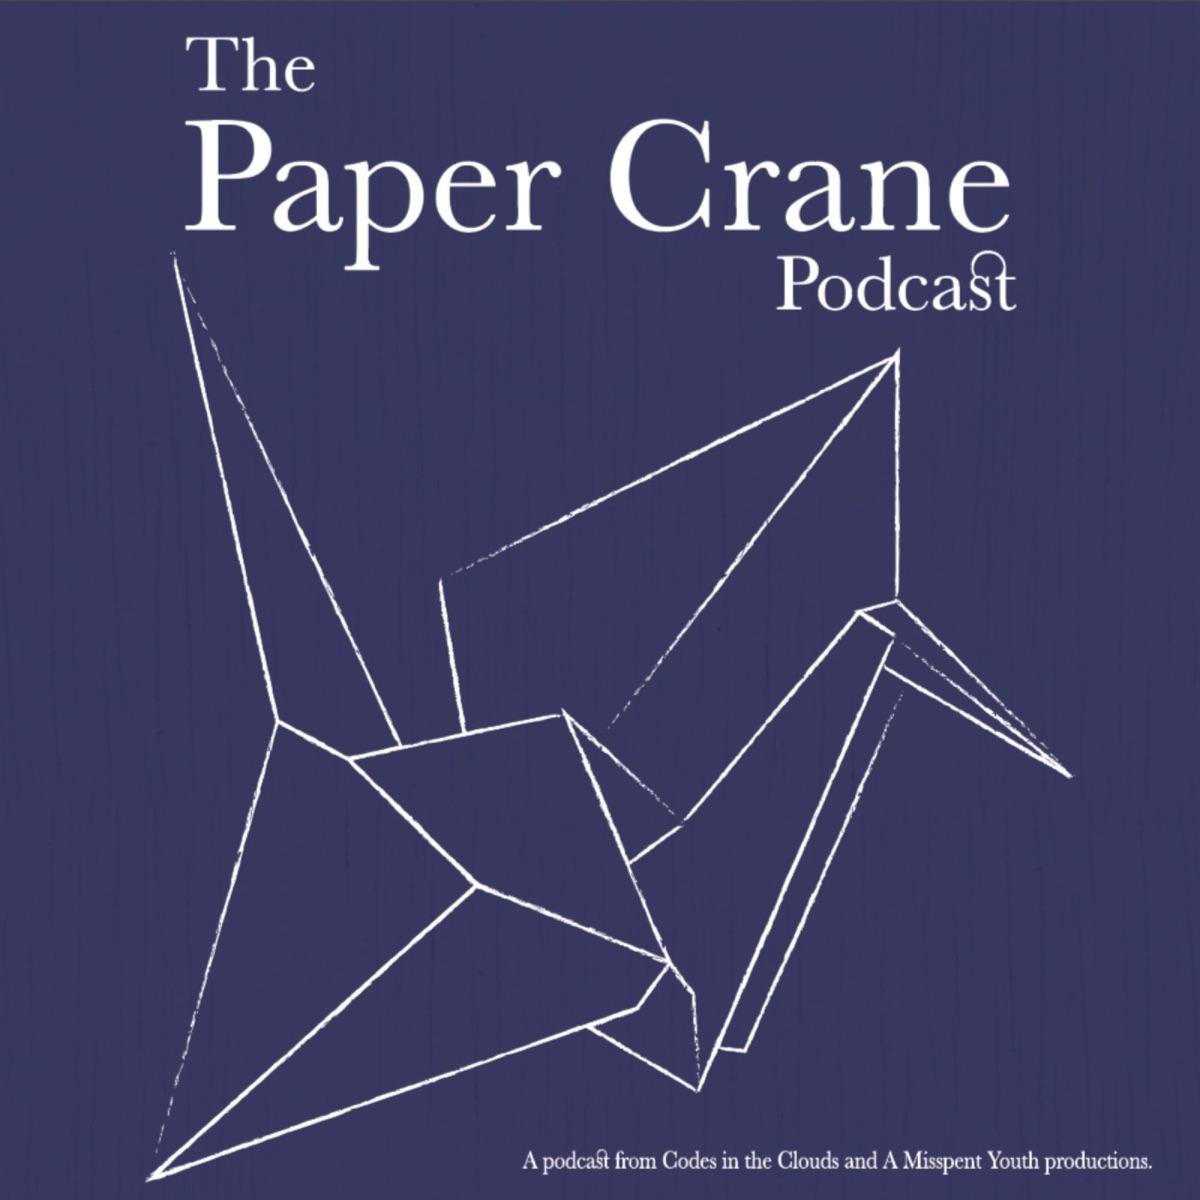 The Paper Crane